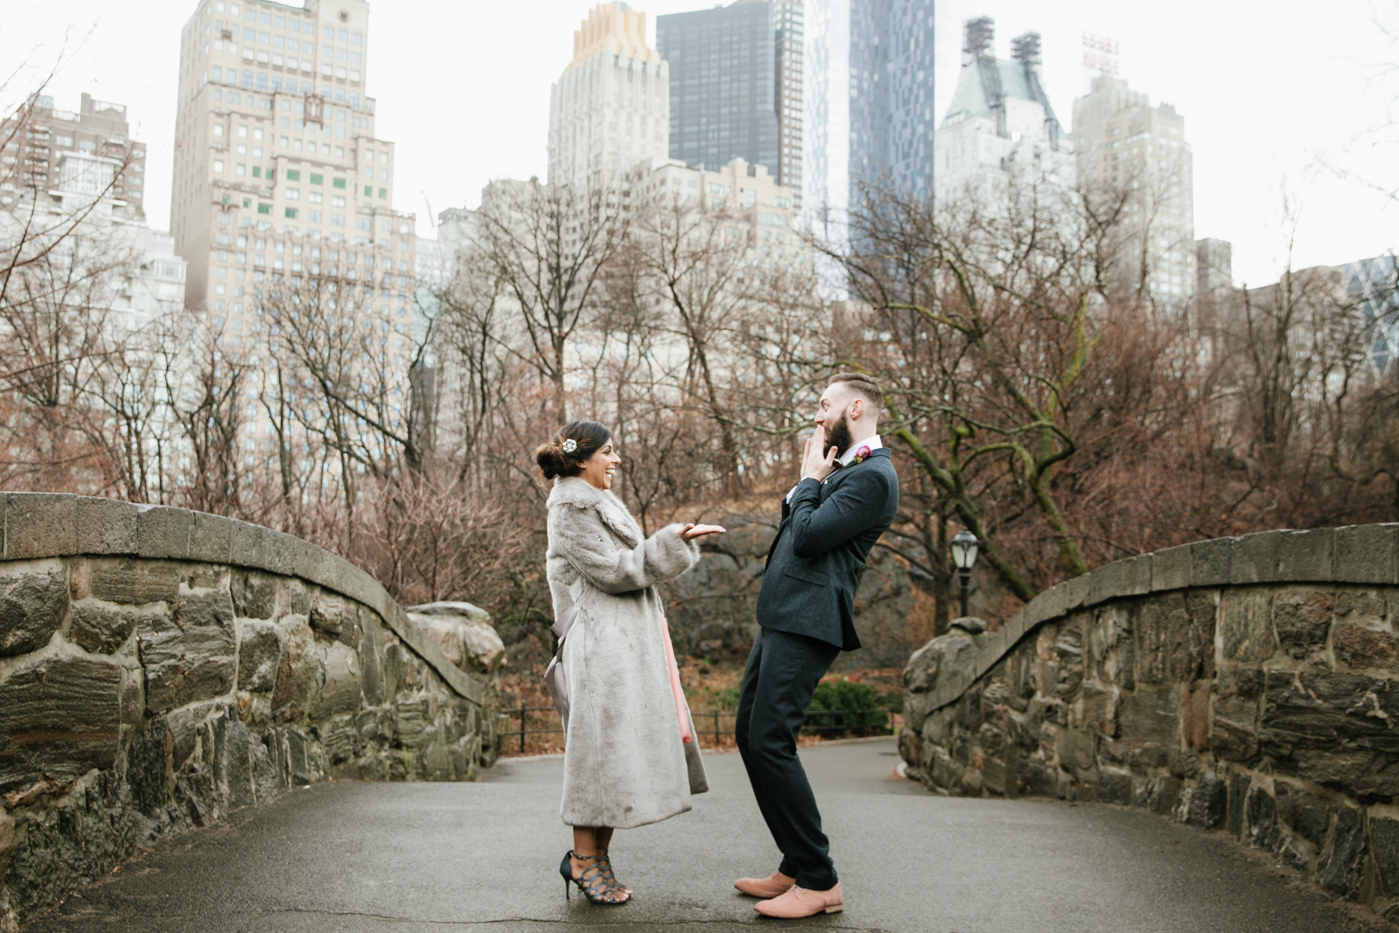 Central-park-wedding-by-Tanya-Isaeva-89.jpg